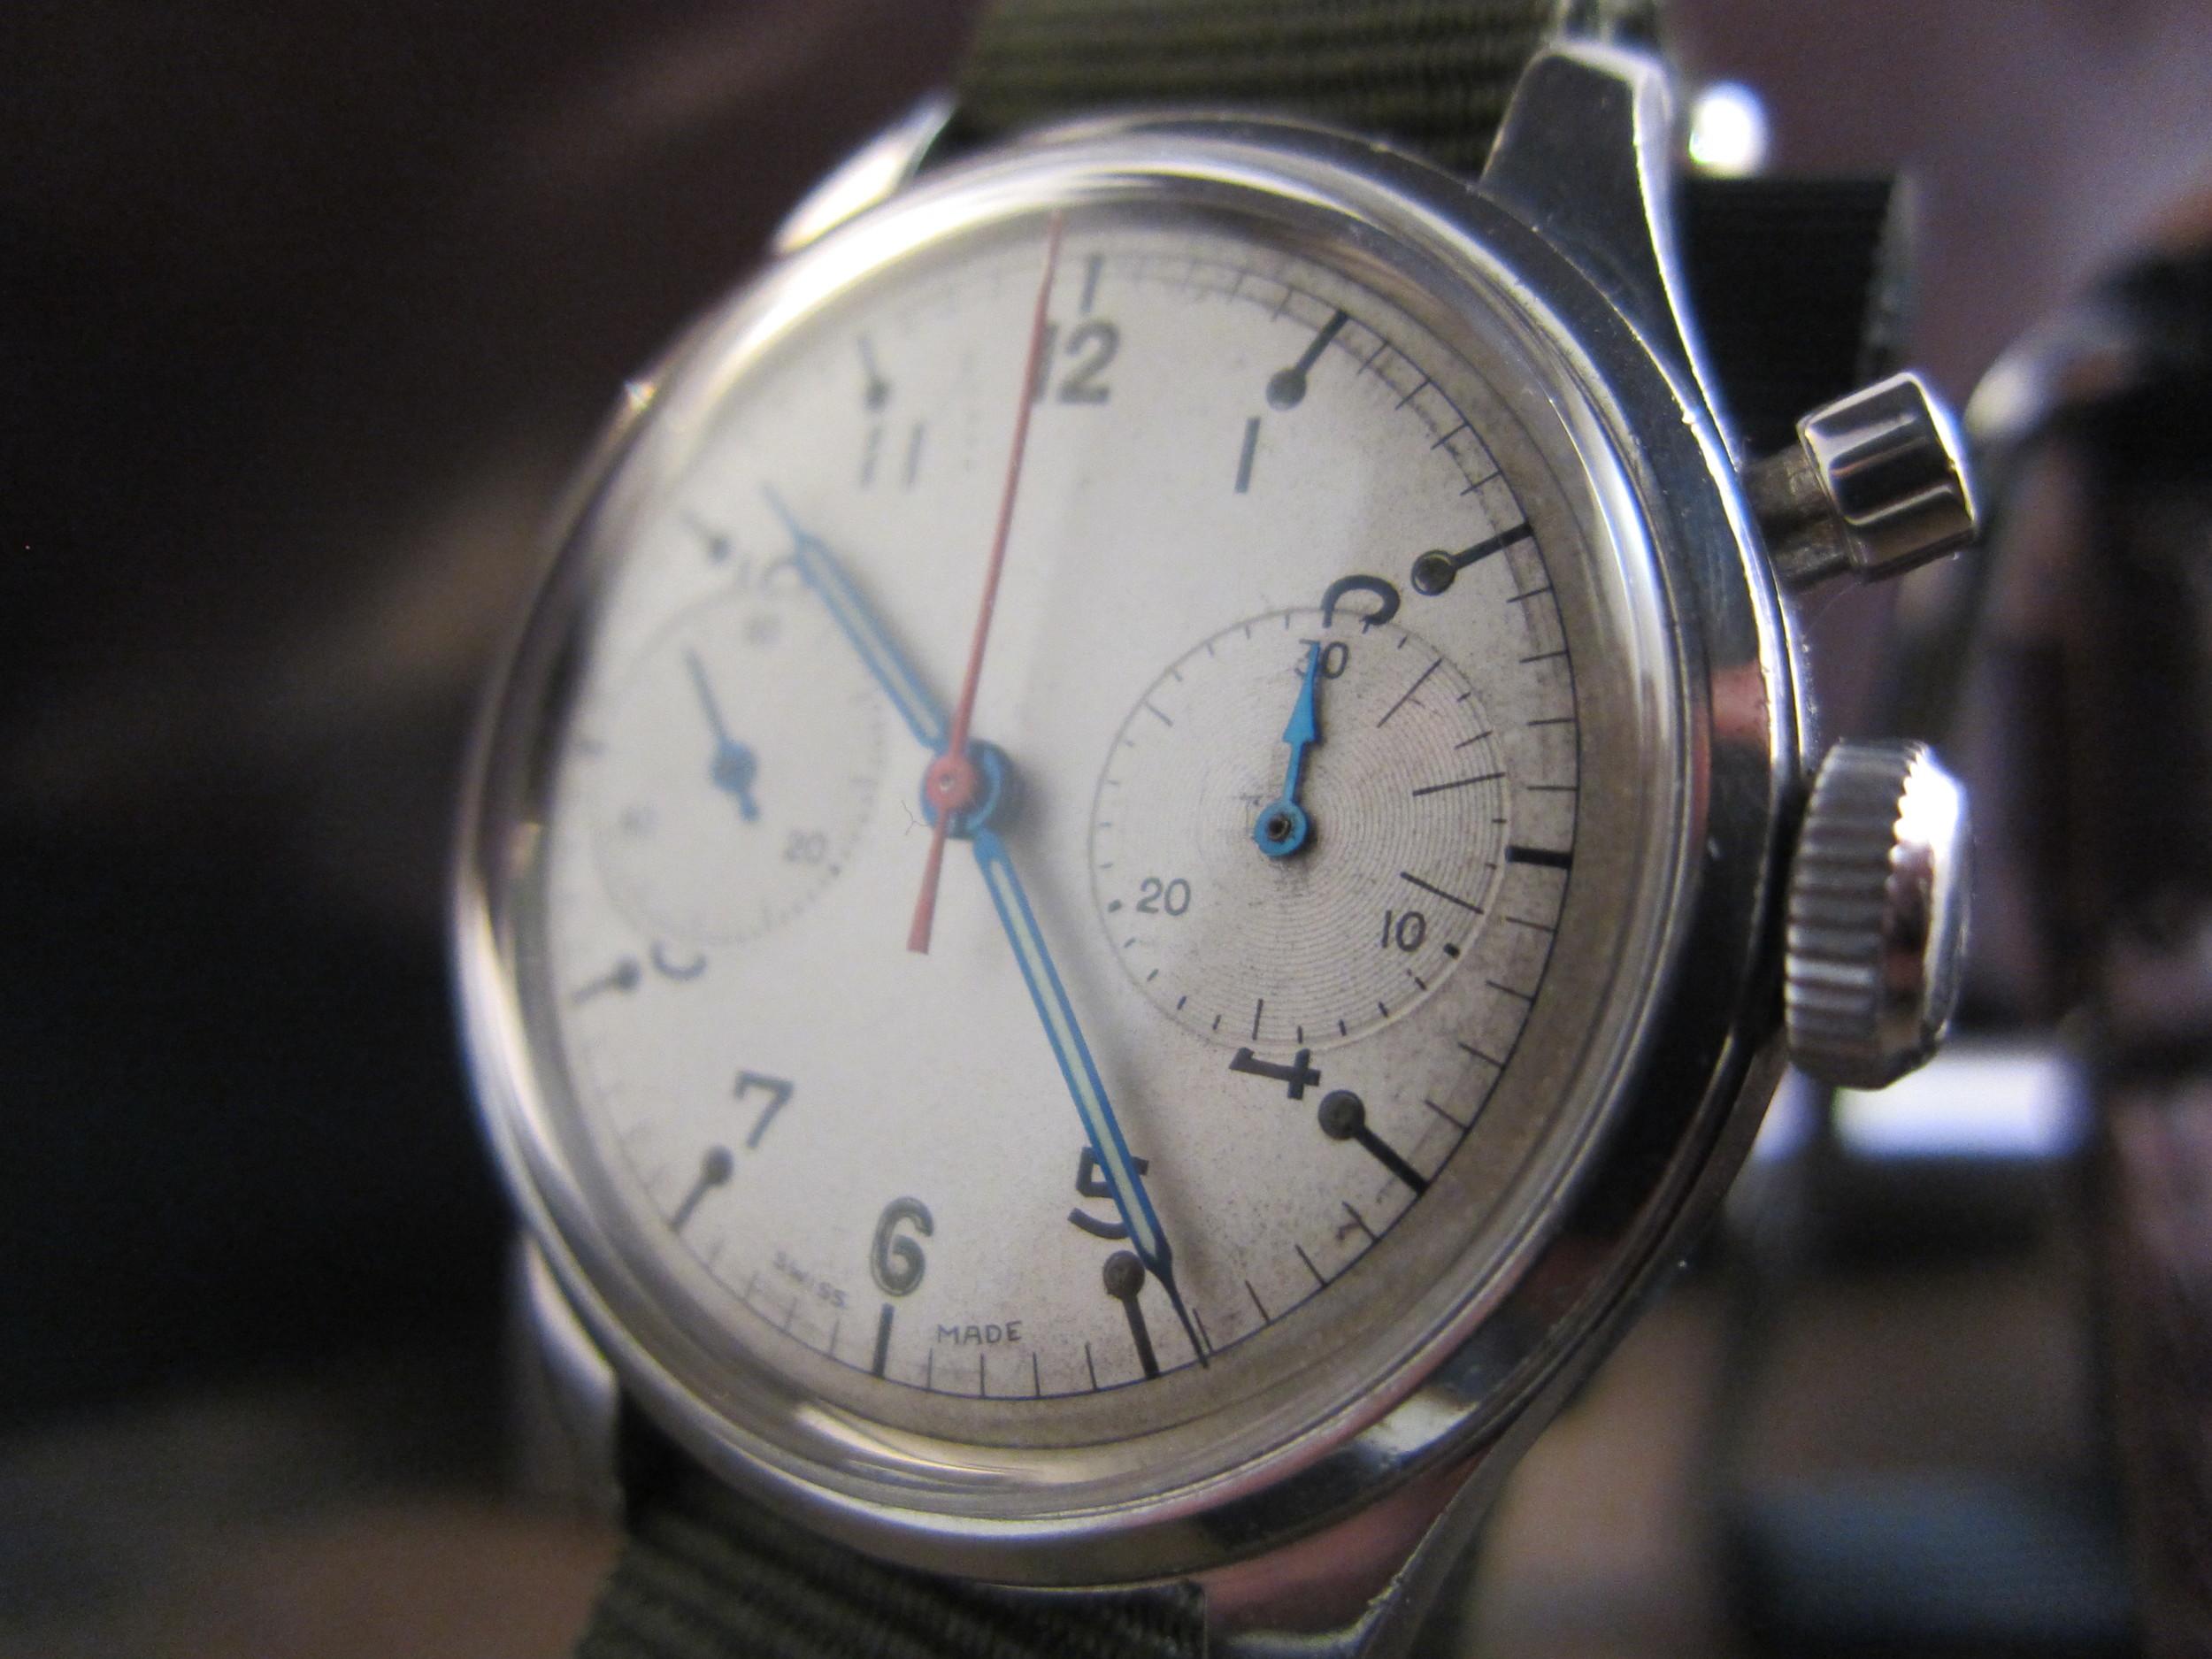 Rodania RCAF one button chronograph.